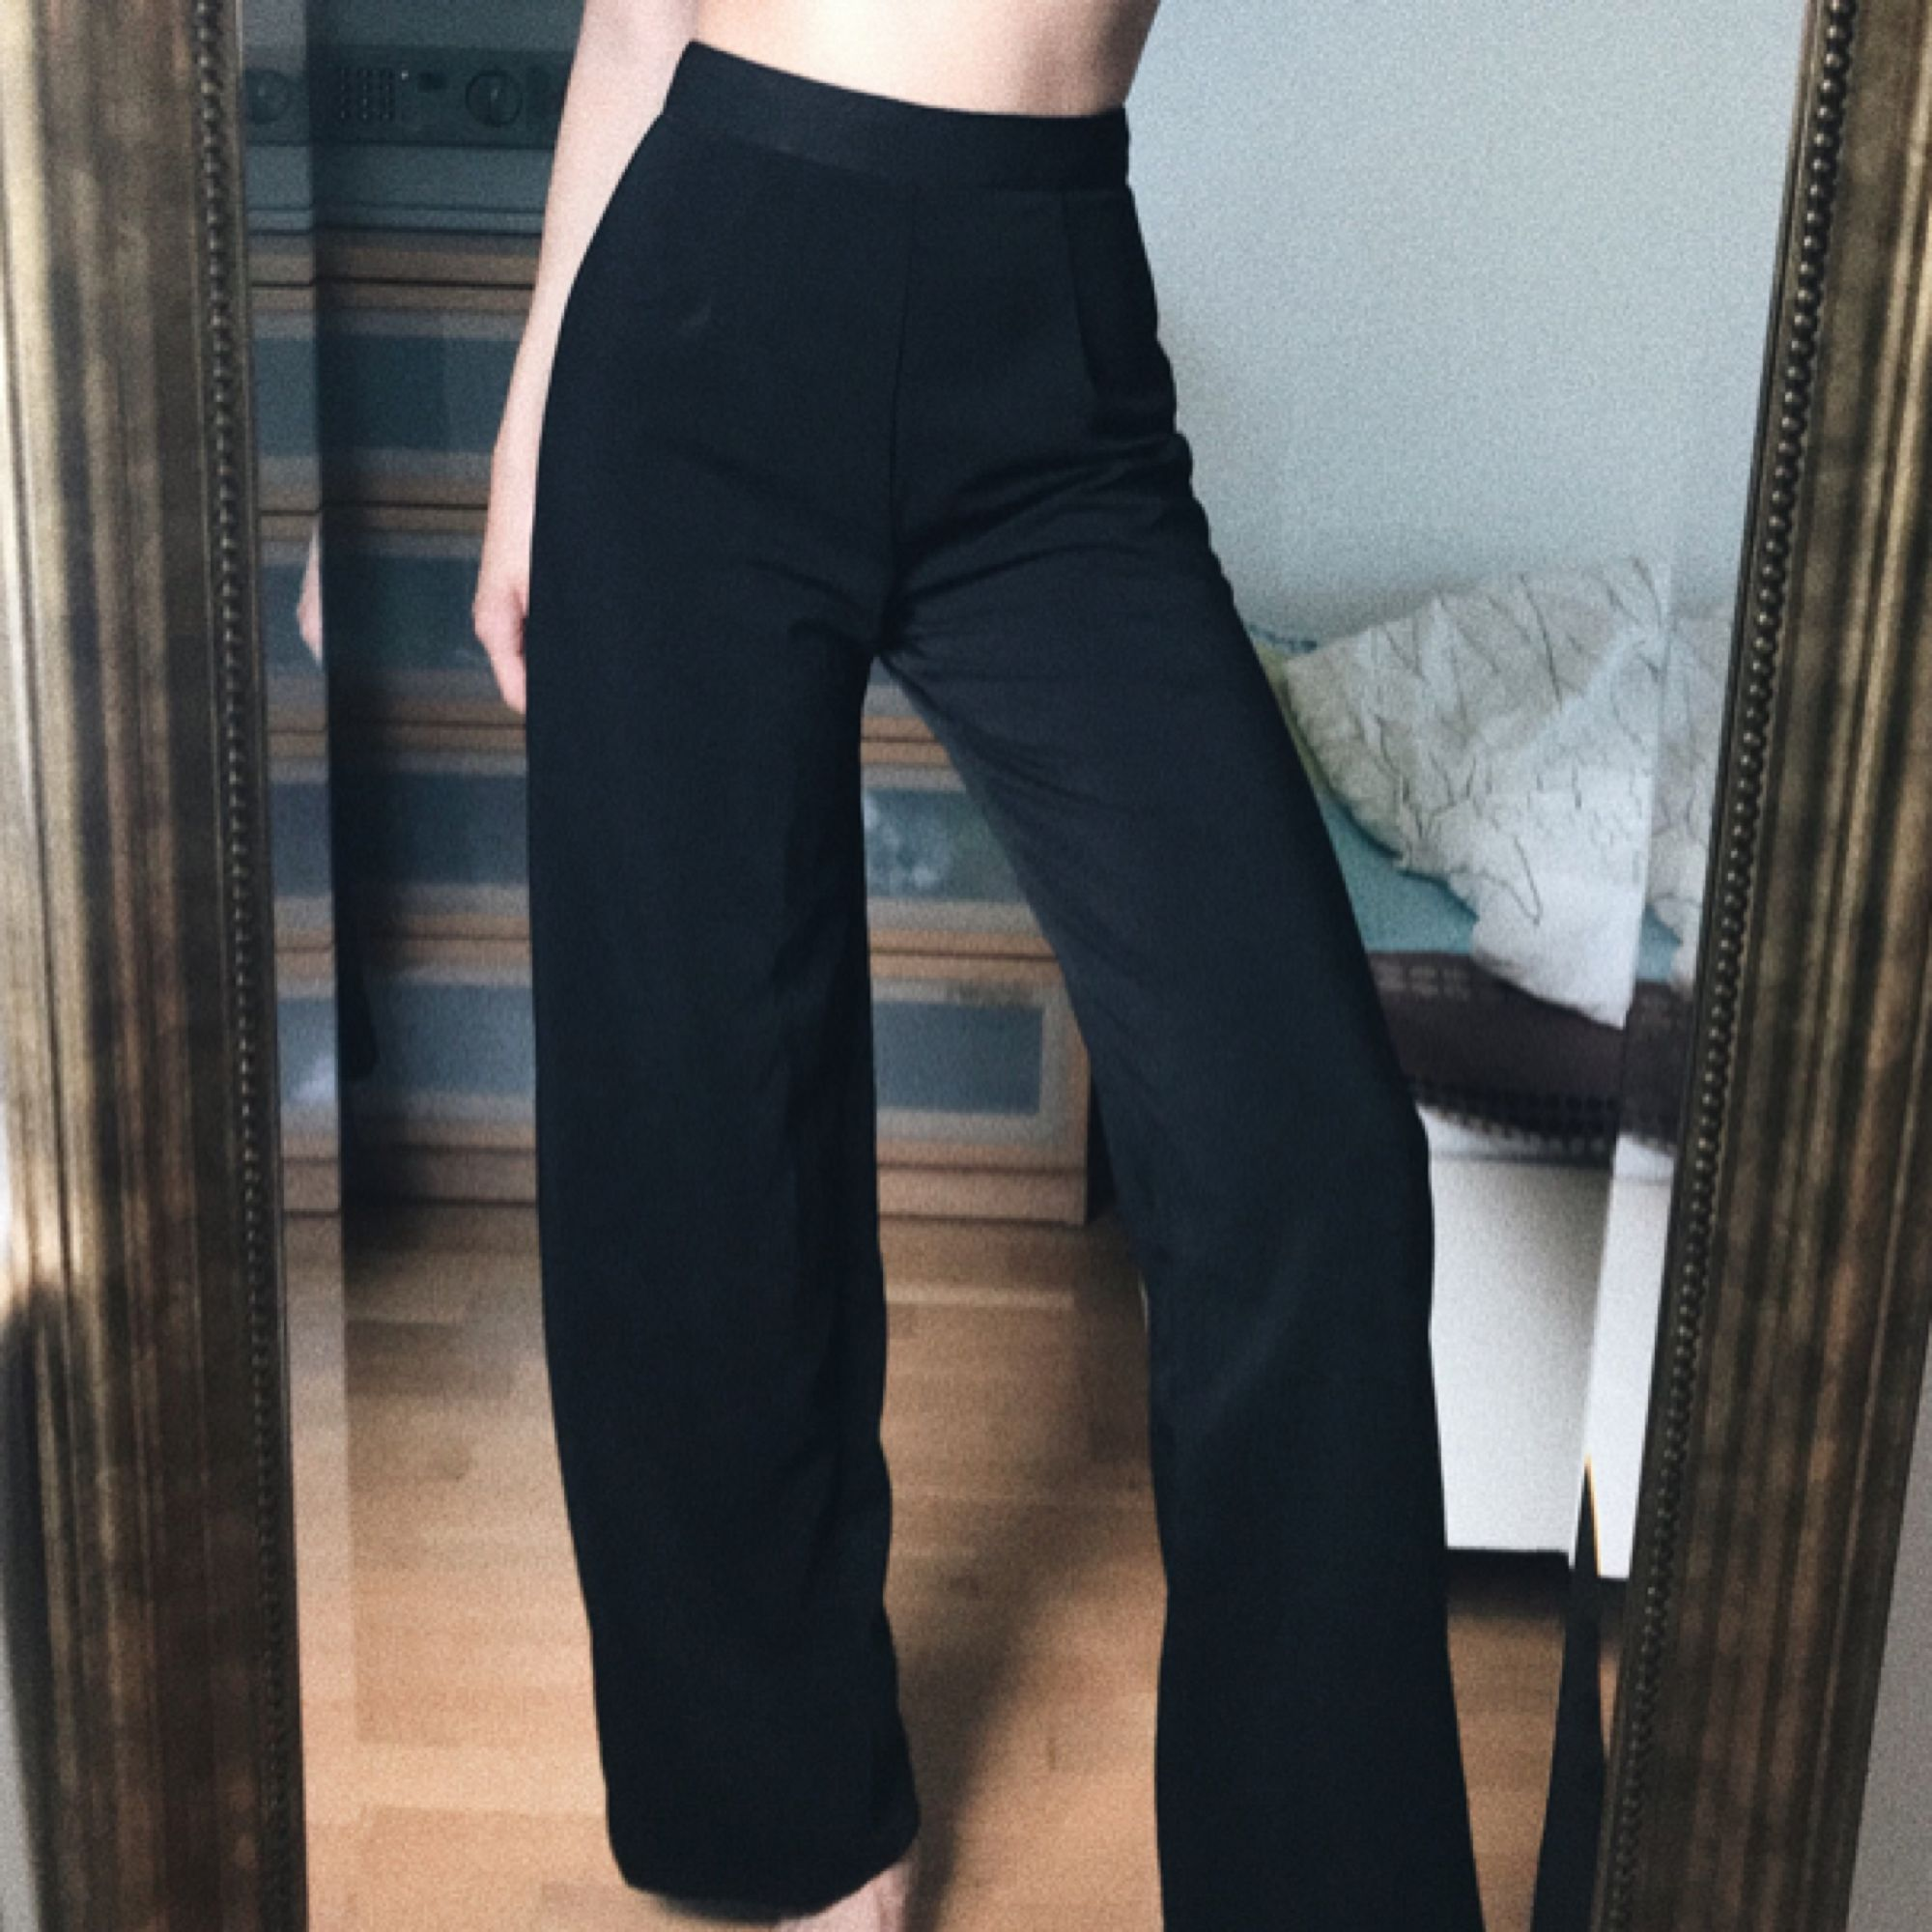 Raka kostymbyxa, knappast använda! ❤️ passar xs-s.. Jeans & Byxor.